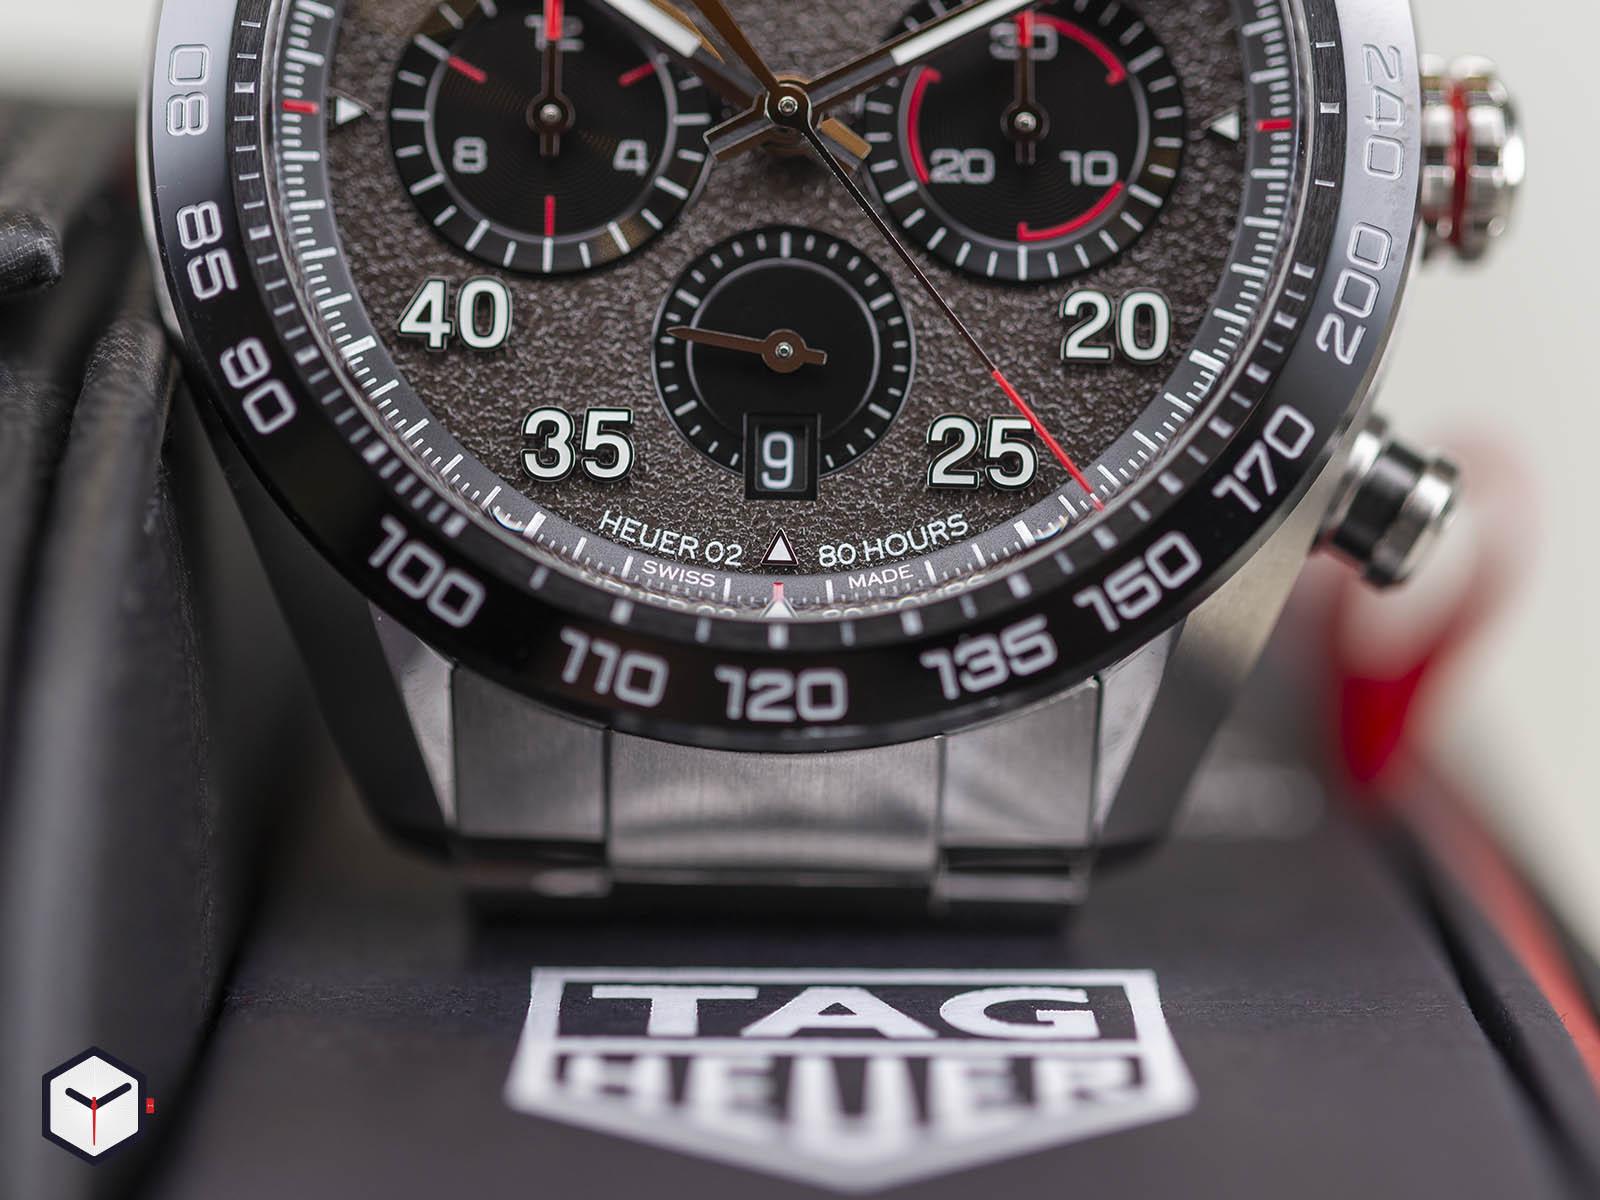 cbn2a1f-ba0643-tag-heuer-carrera-porsche-chronograph-1-4.jpg